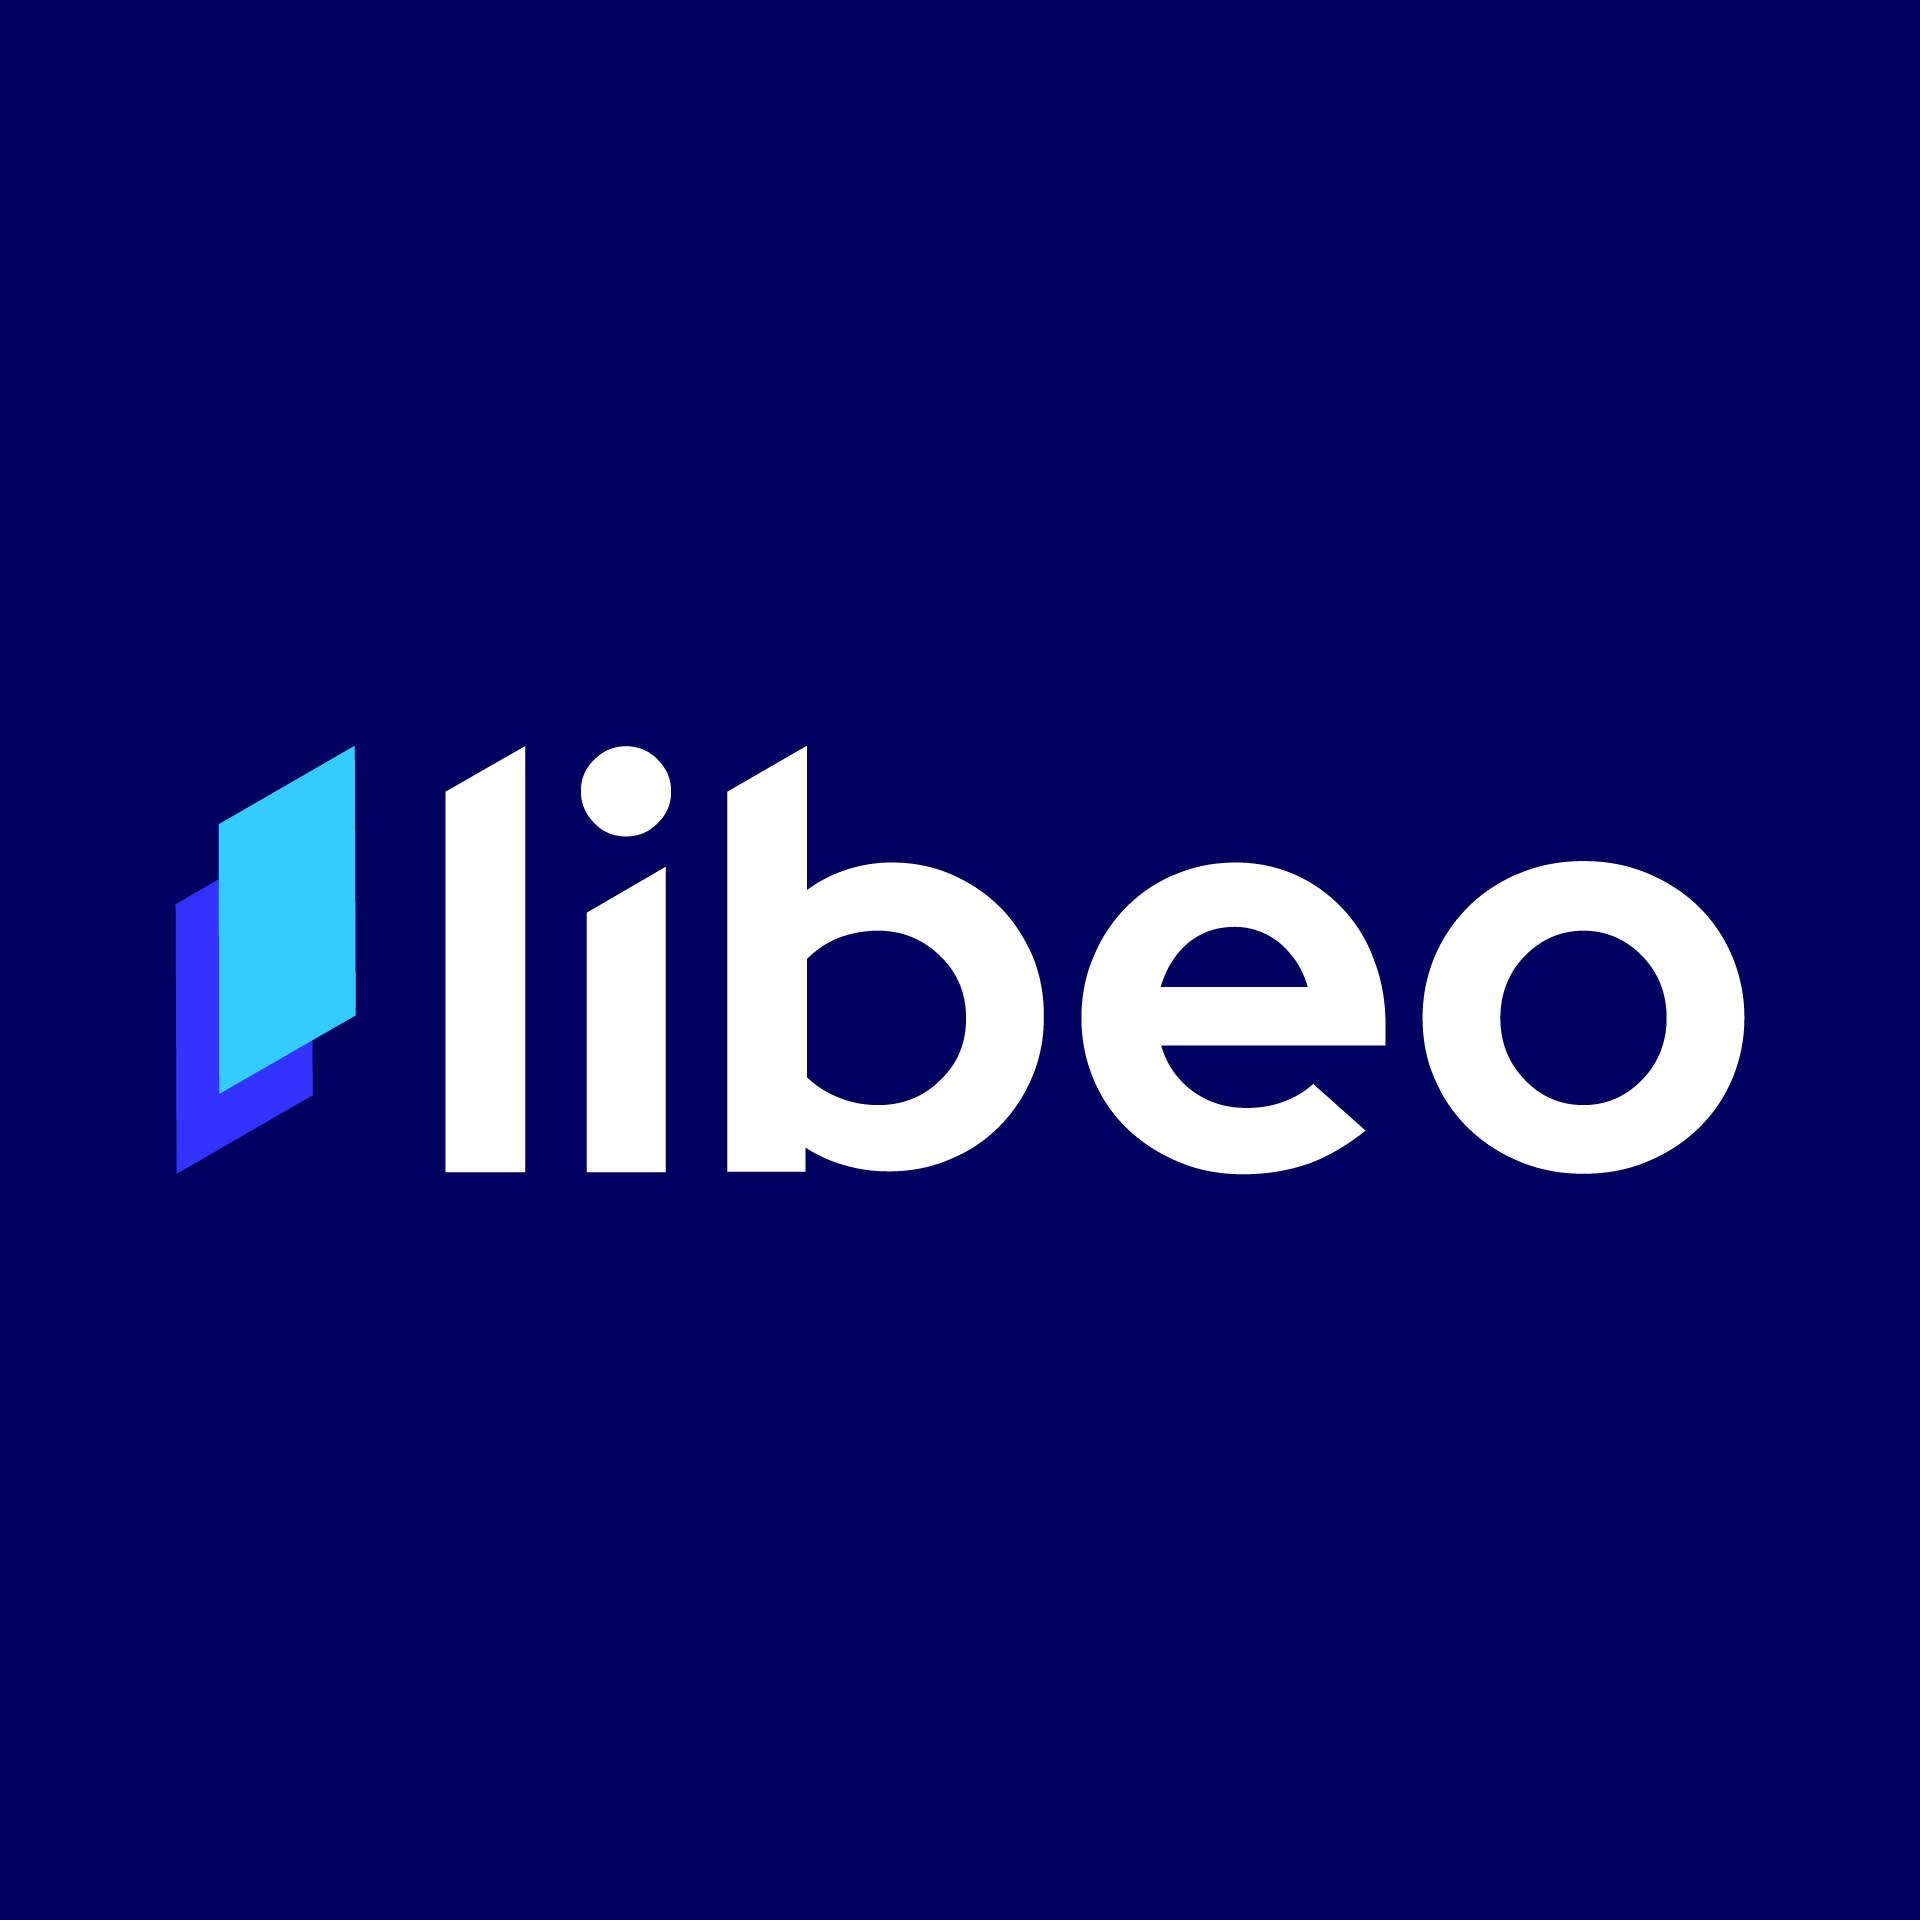 Libeo's logo